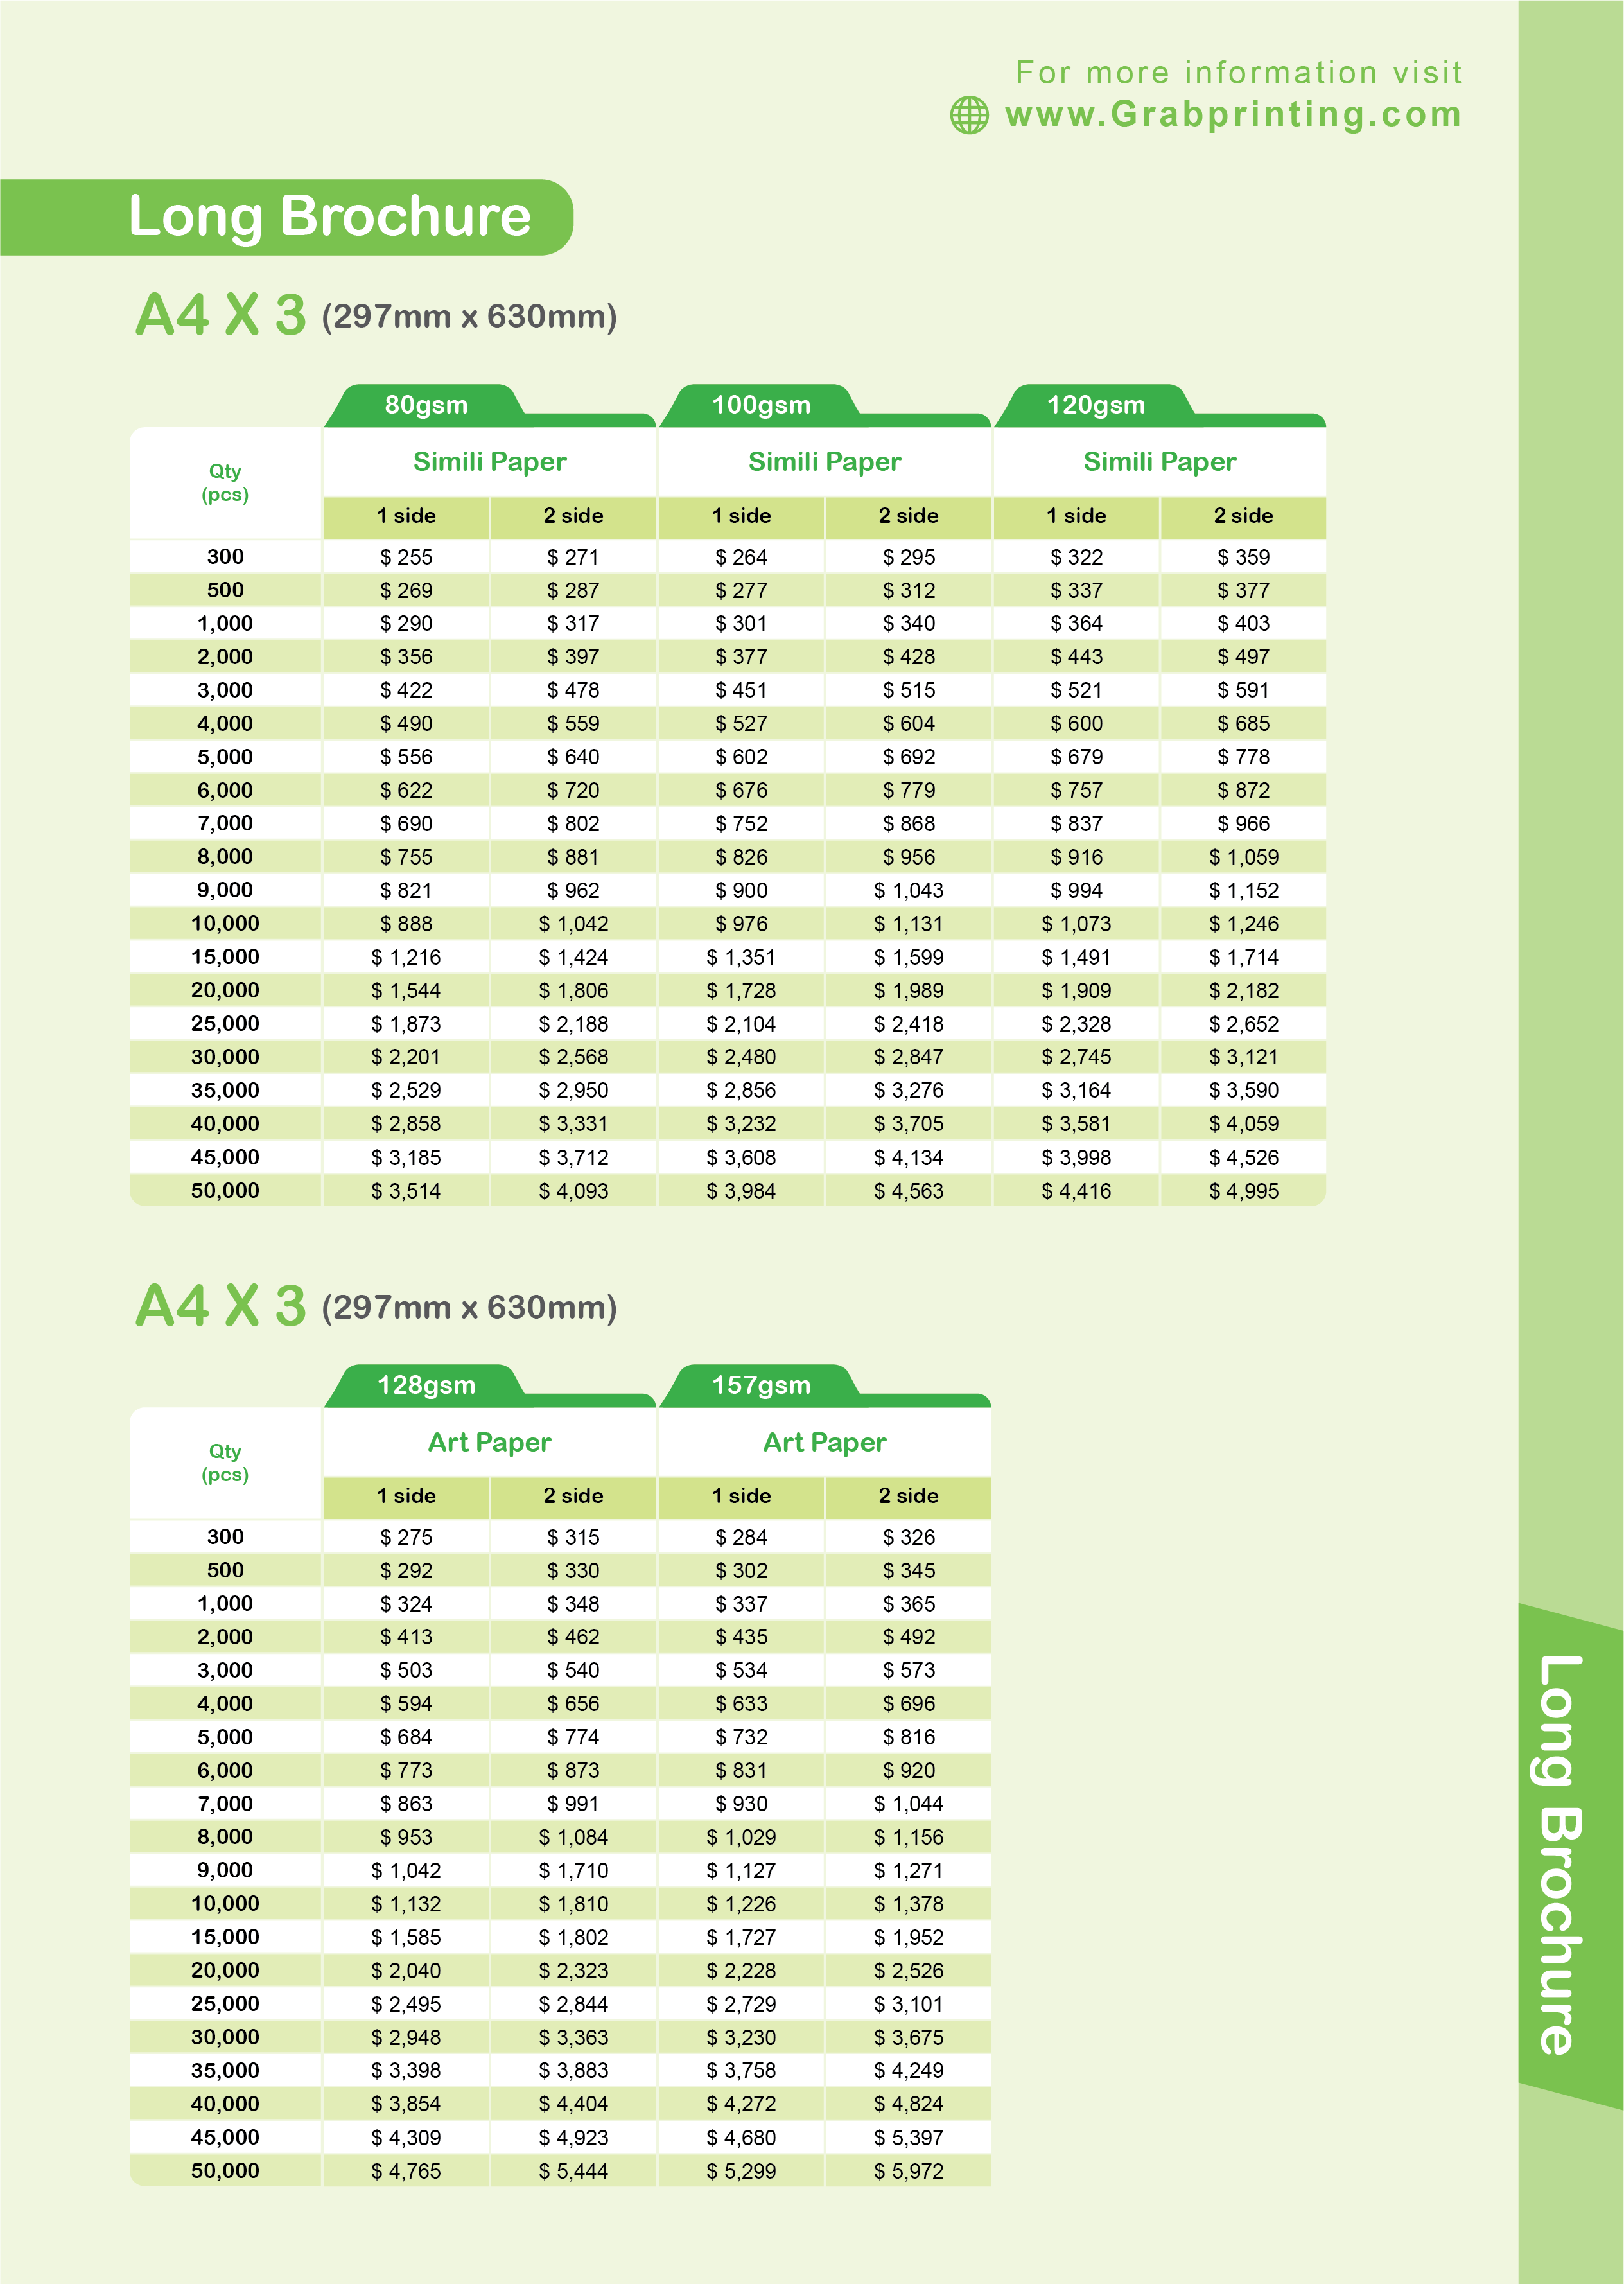 brochure printing Brochure Printing Long Brochure A4 x 3 Paper Price List